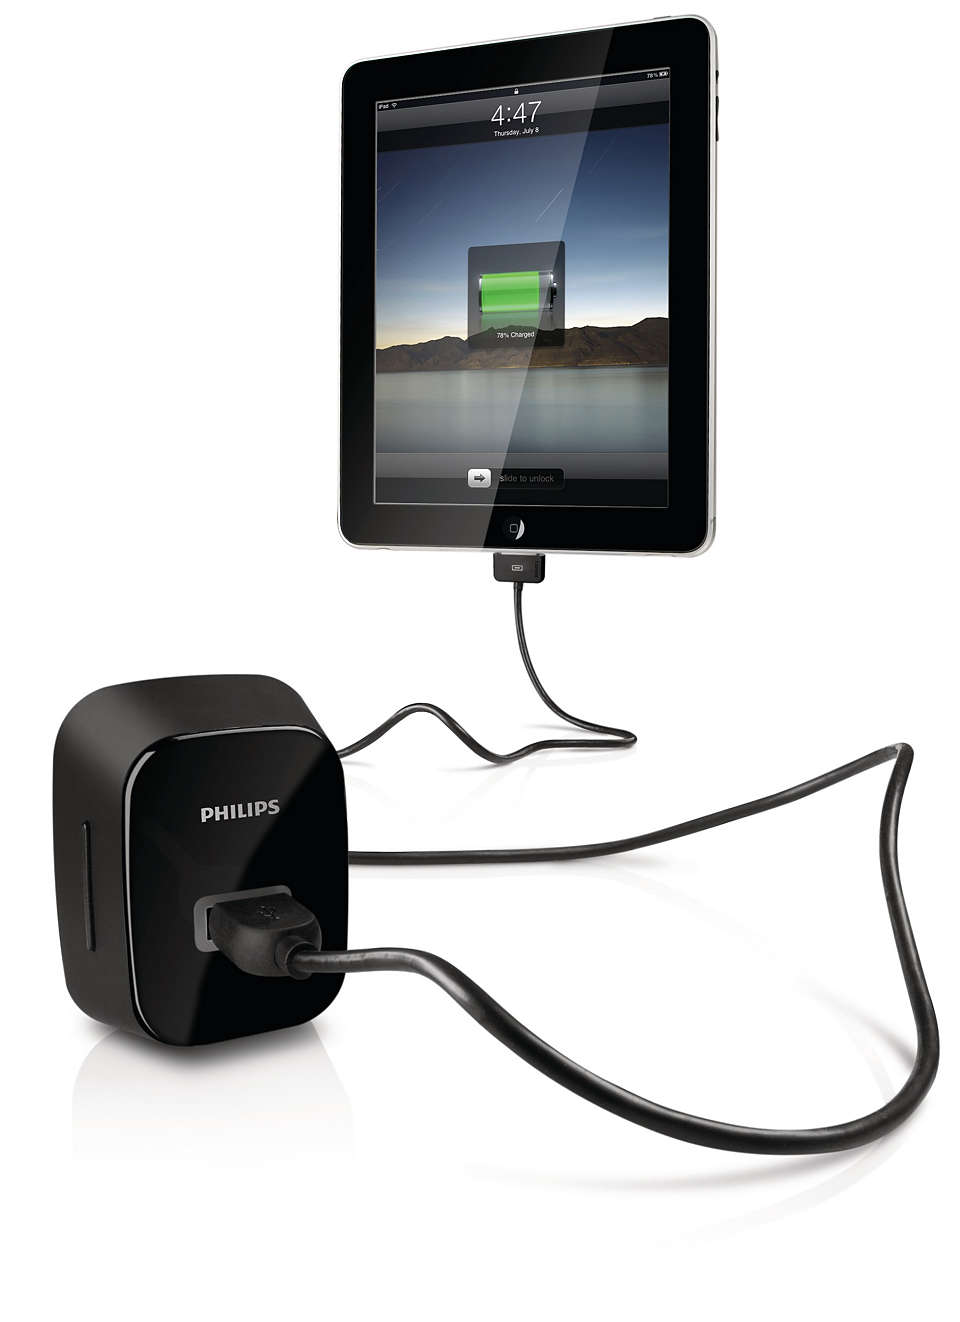 Charge your iPad, iPhone iPod